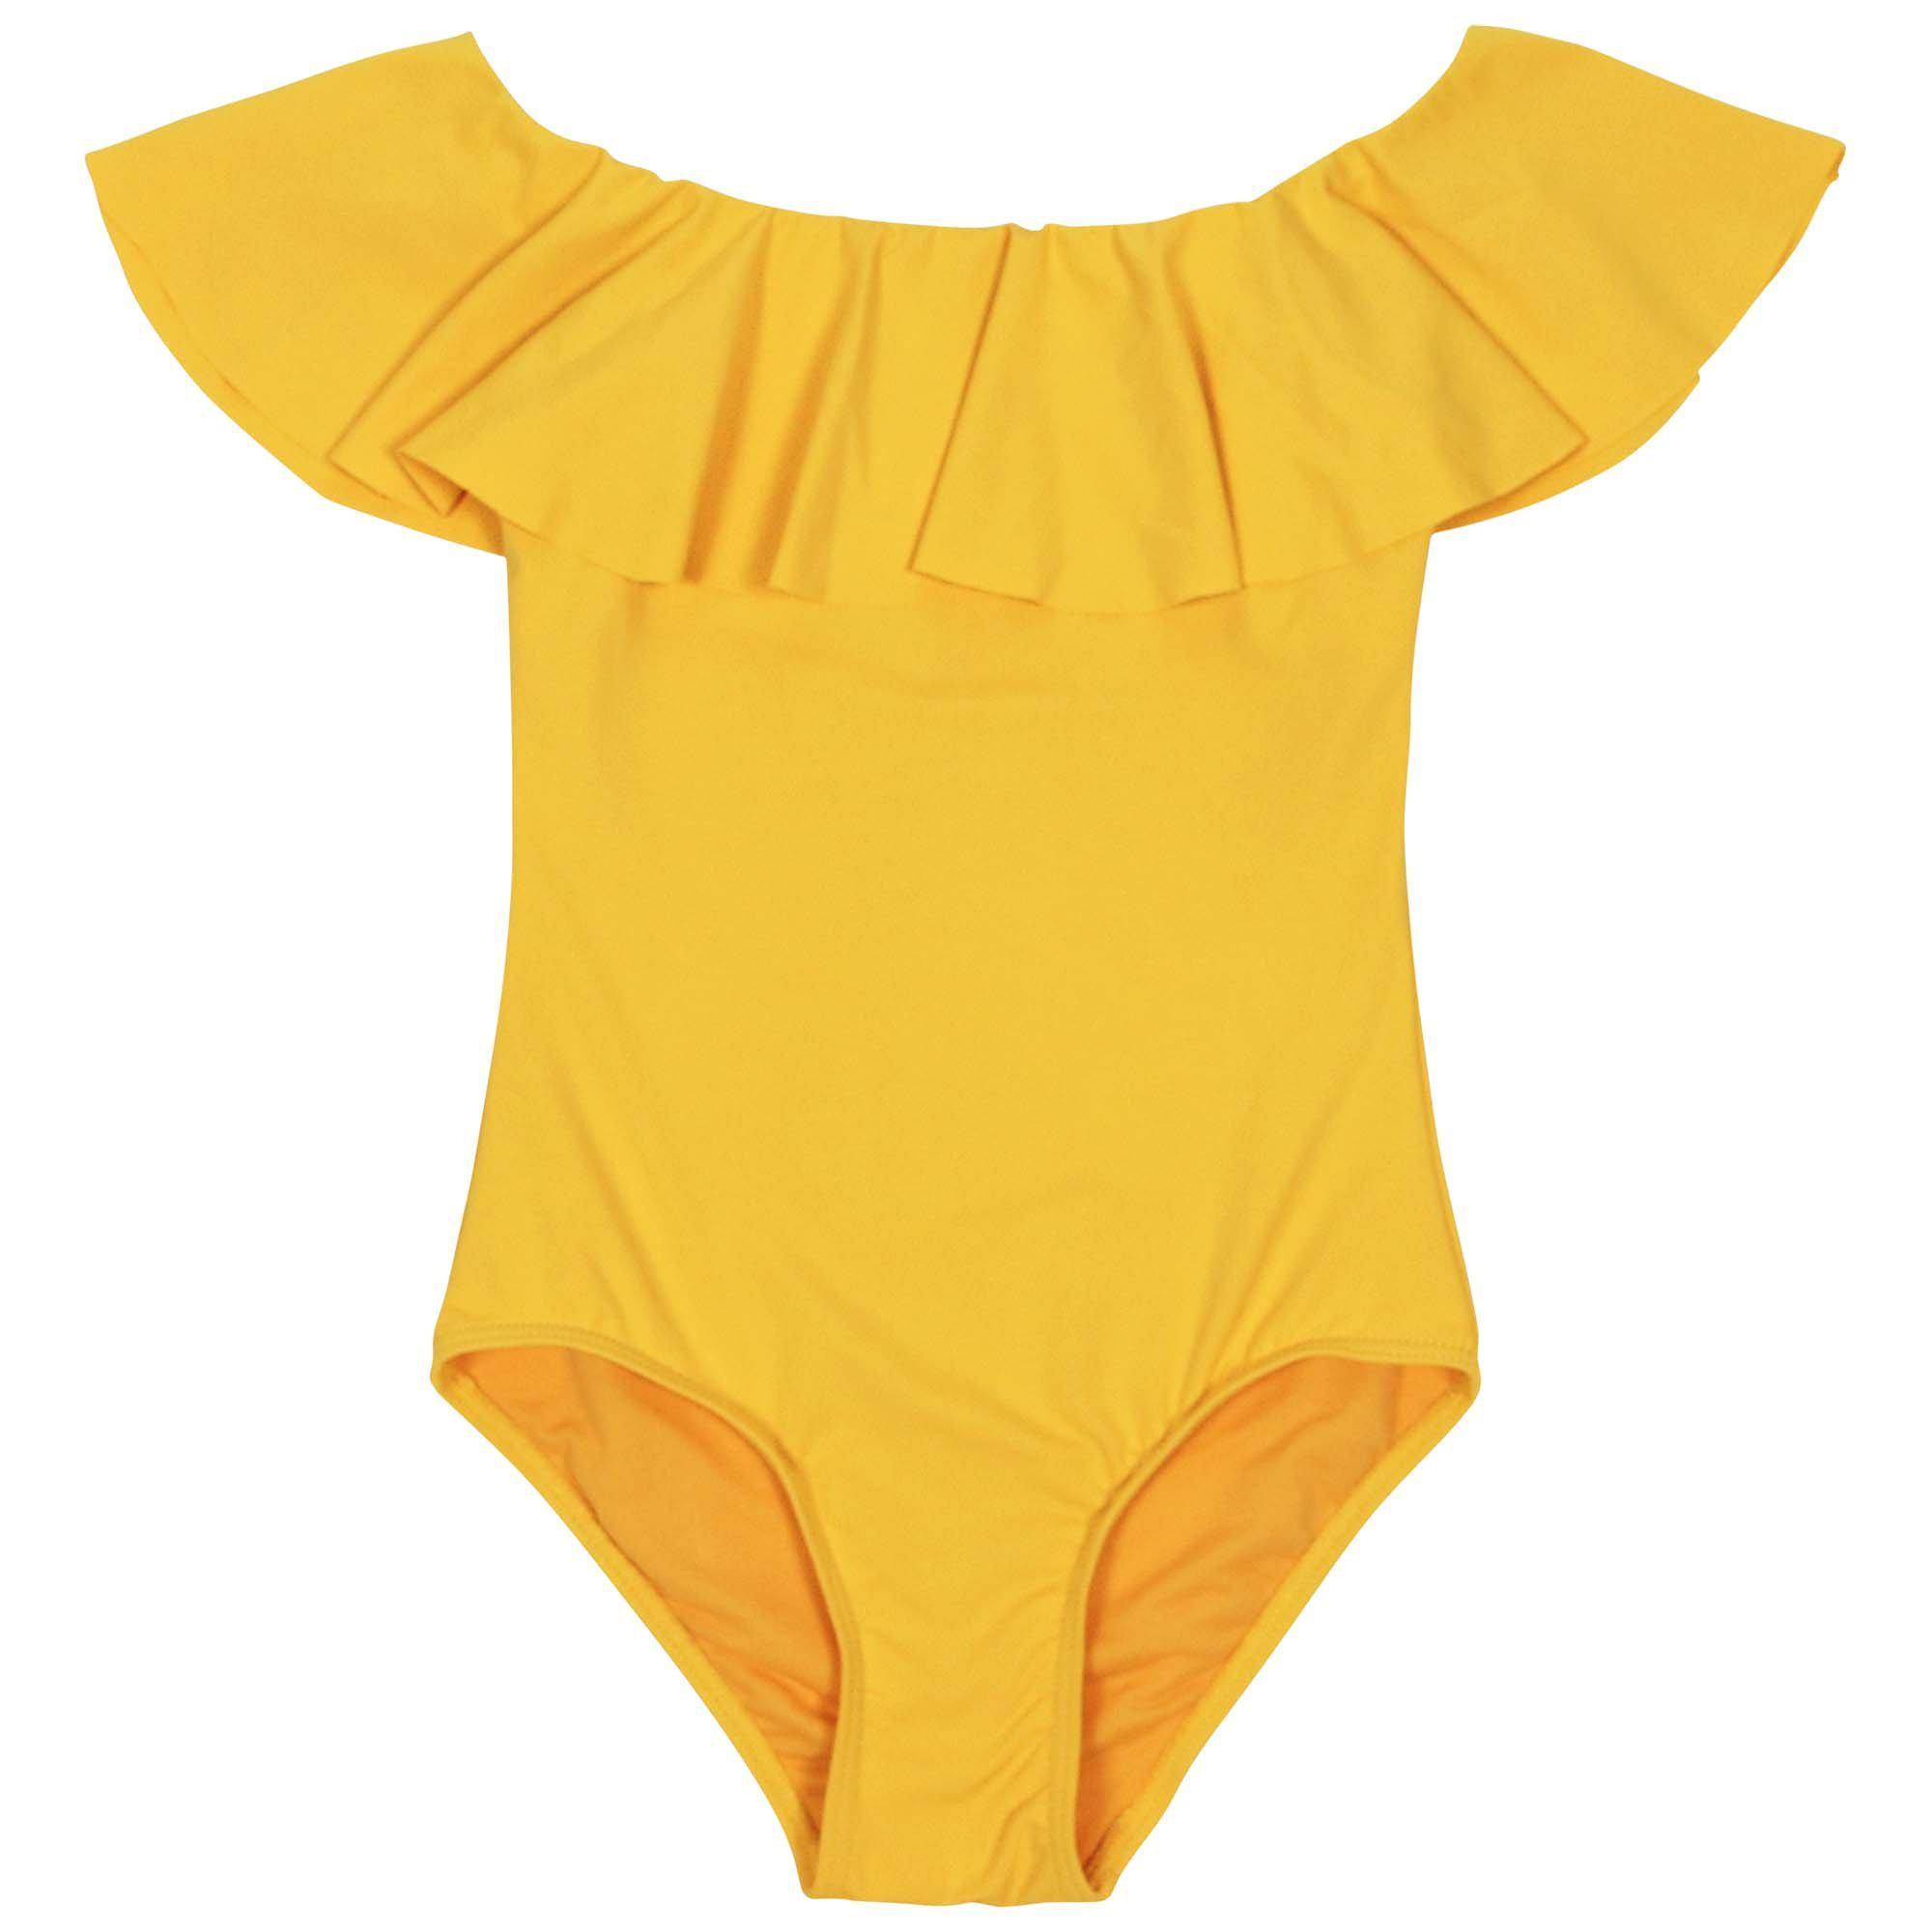 6b6c067304ecd Lyst - BURU White Label Mini Me Off The Shoulder Swimsuit in Yellow